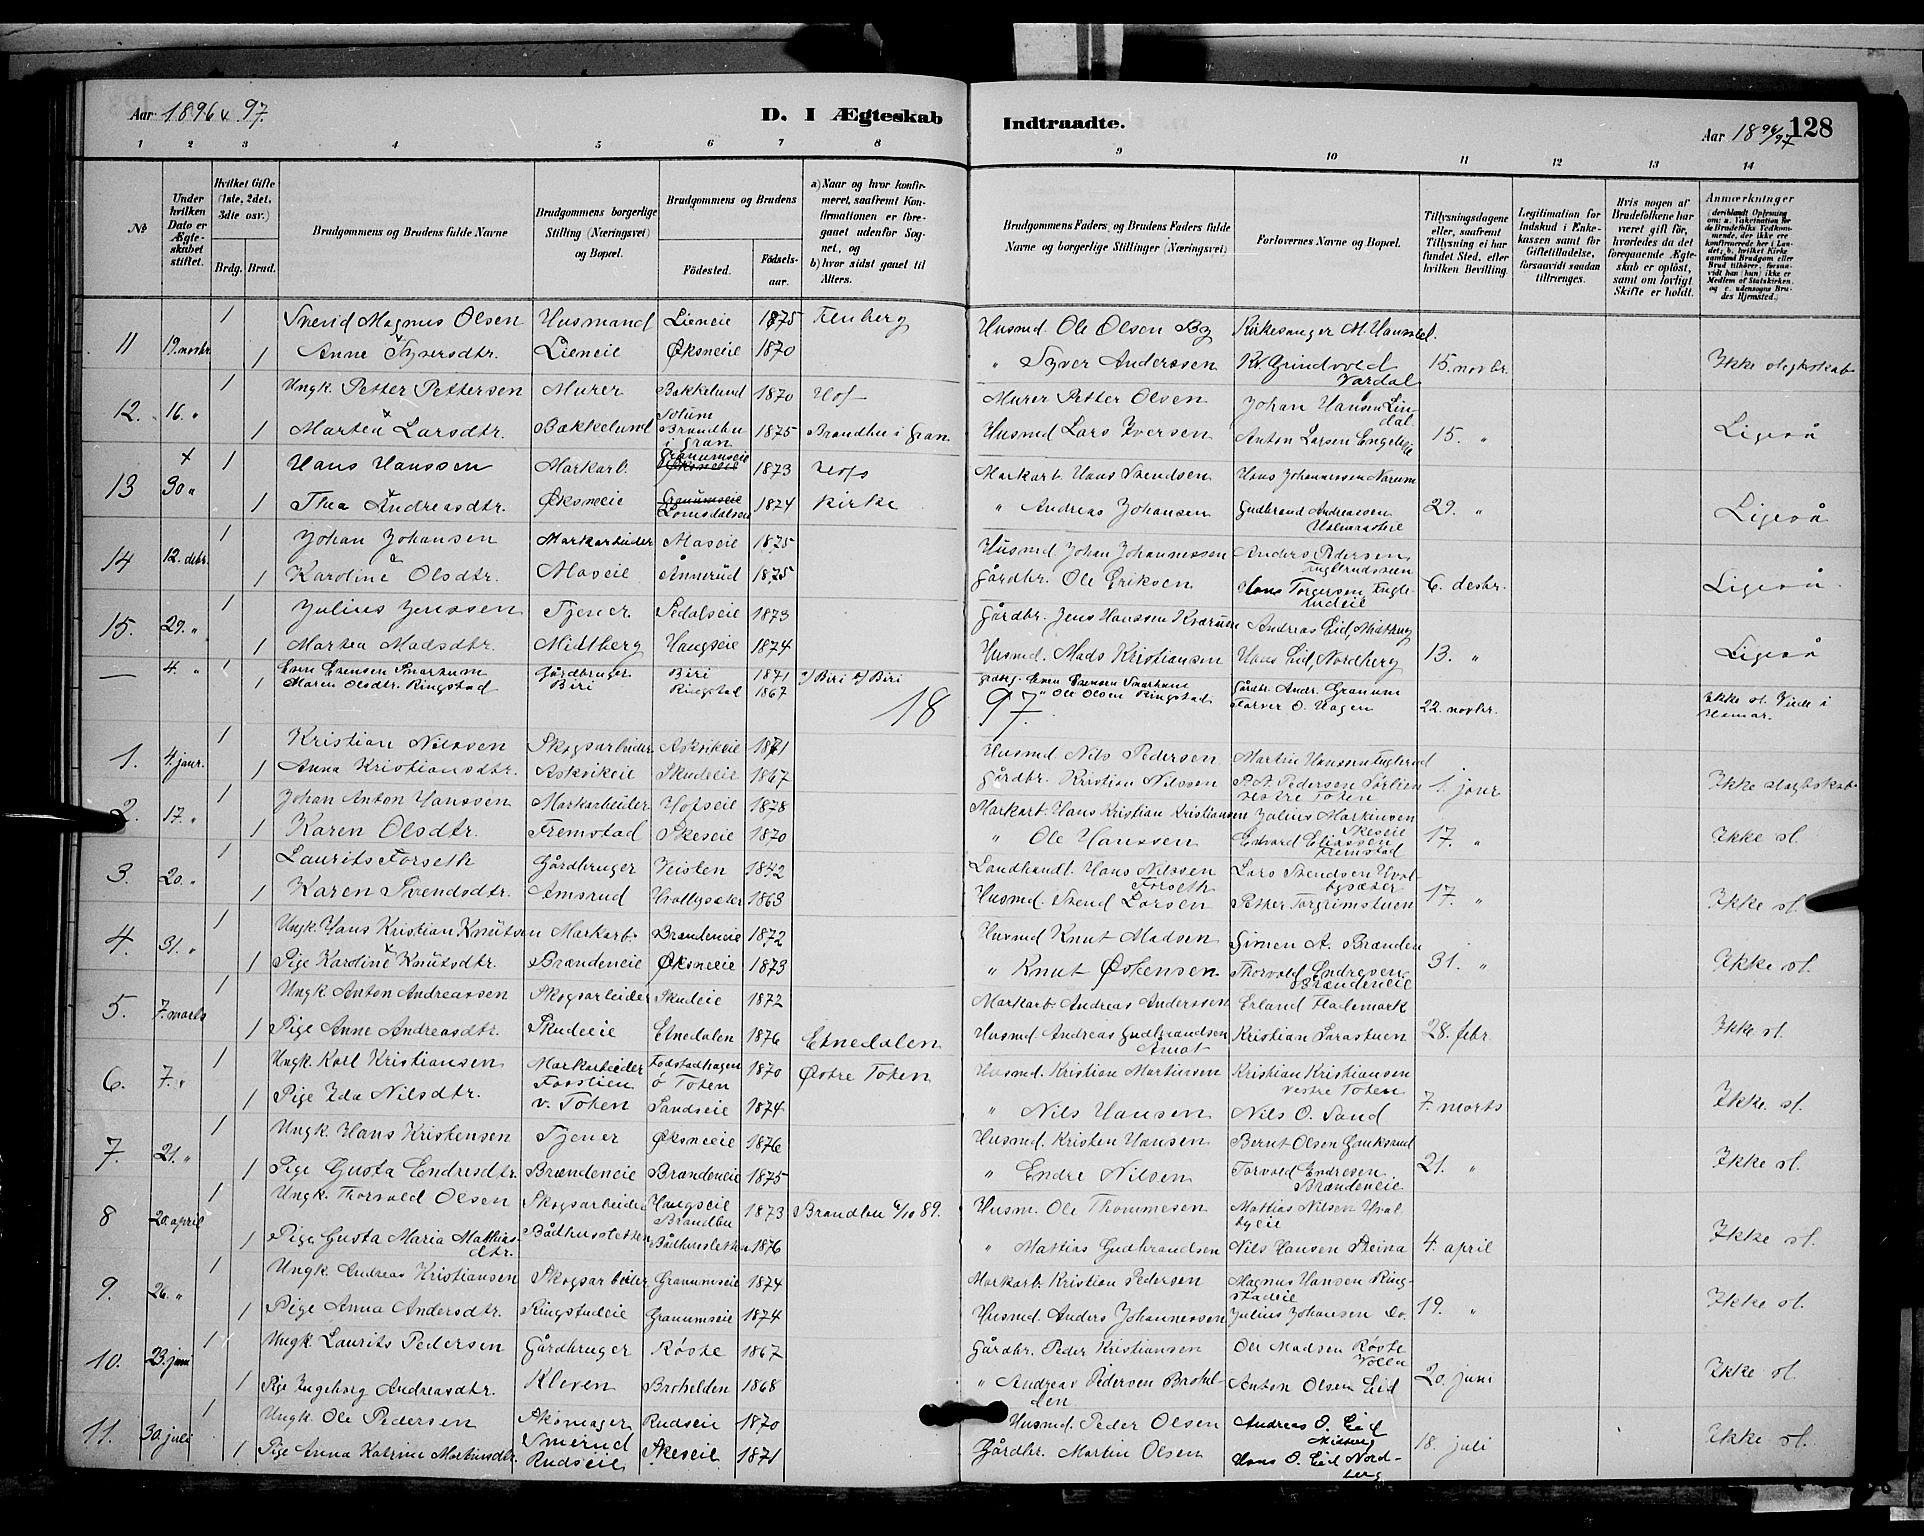 SAH, Søndre Land prestekontor, L/L0002: Klokkerbok nr. 2, 1884-1900, s. 128